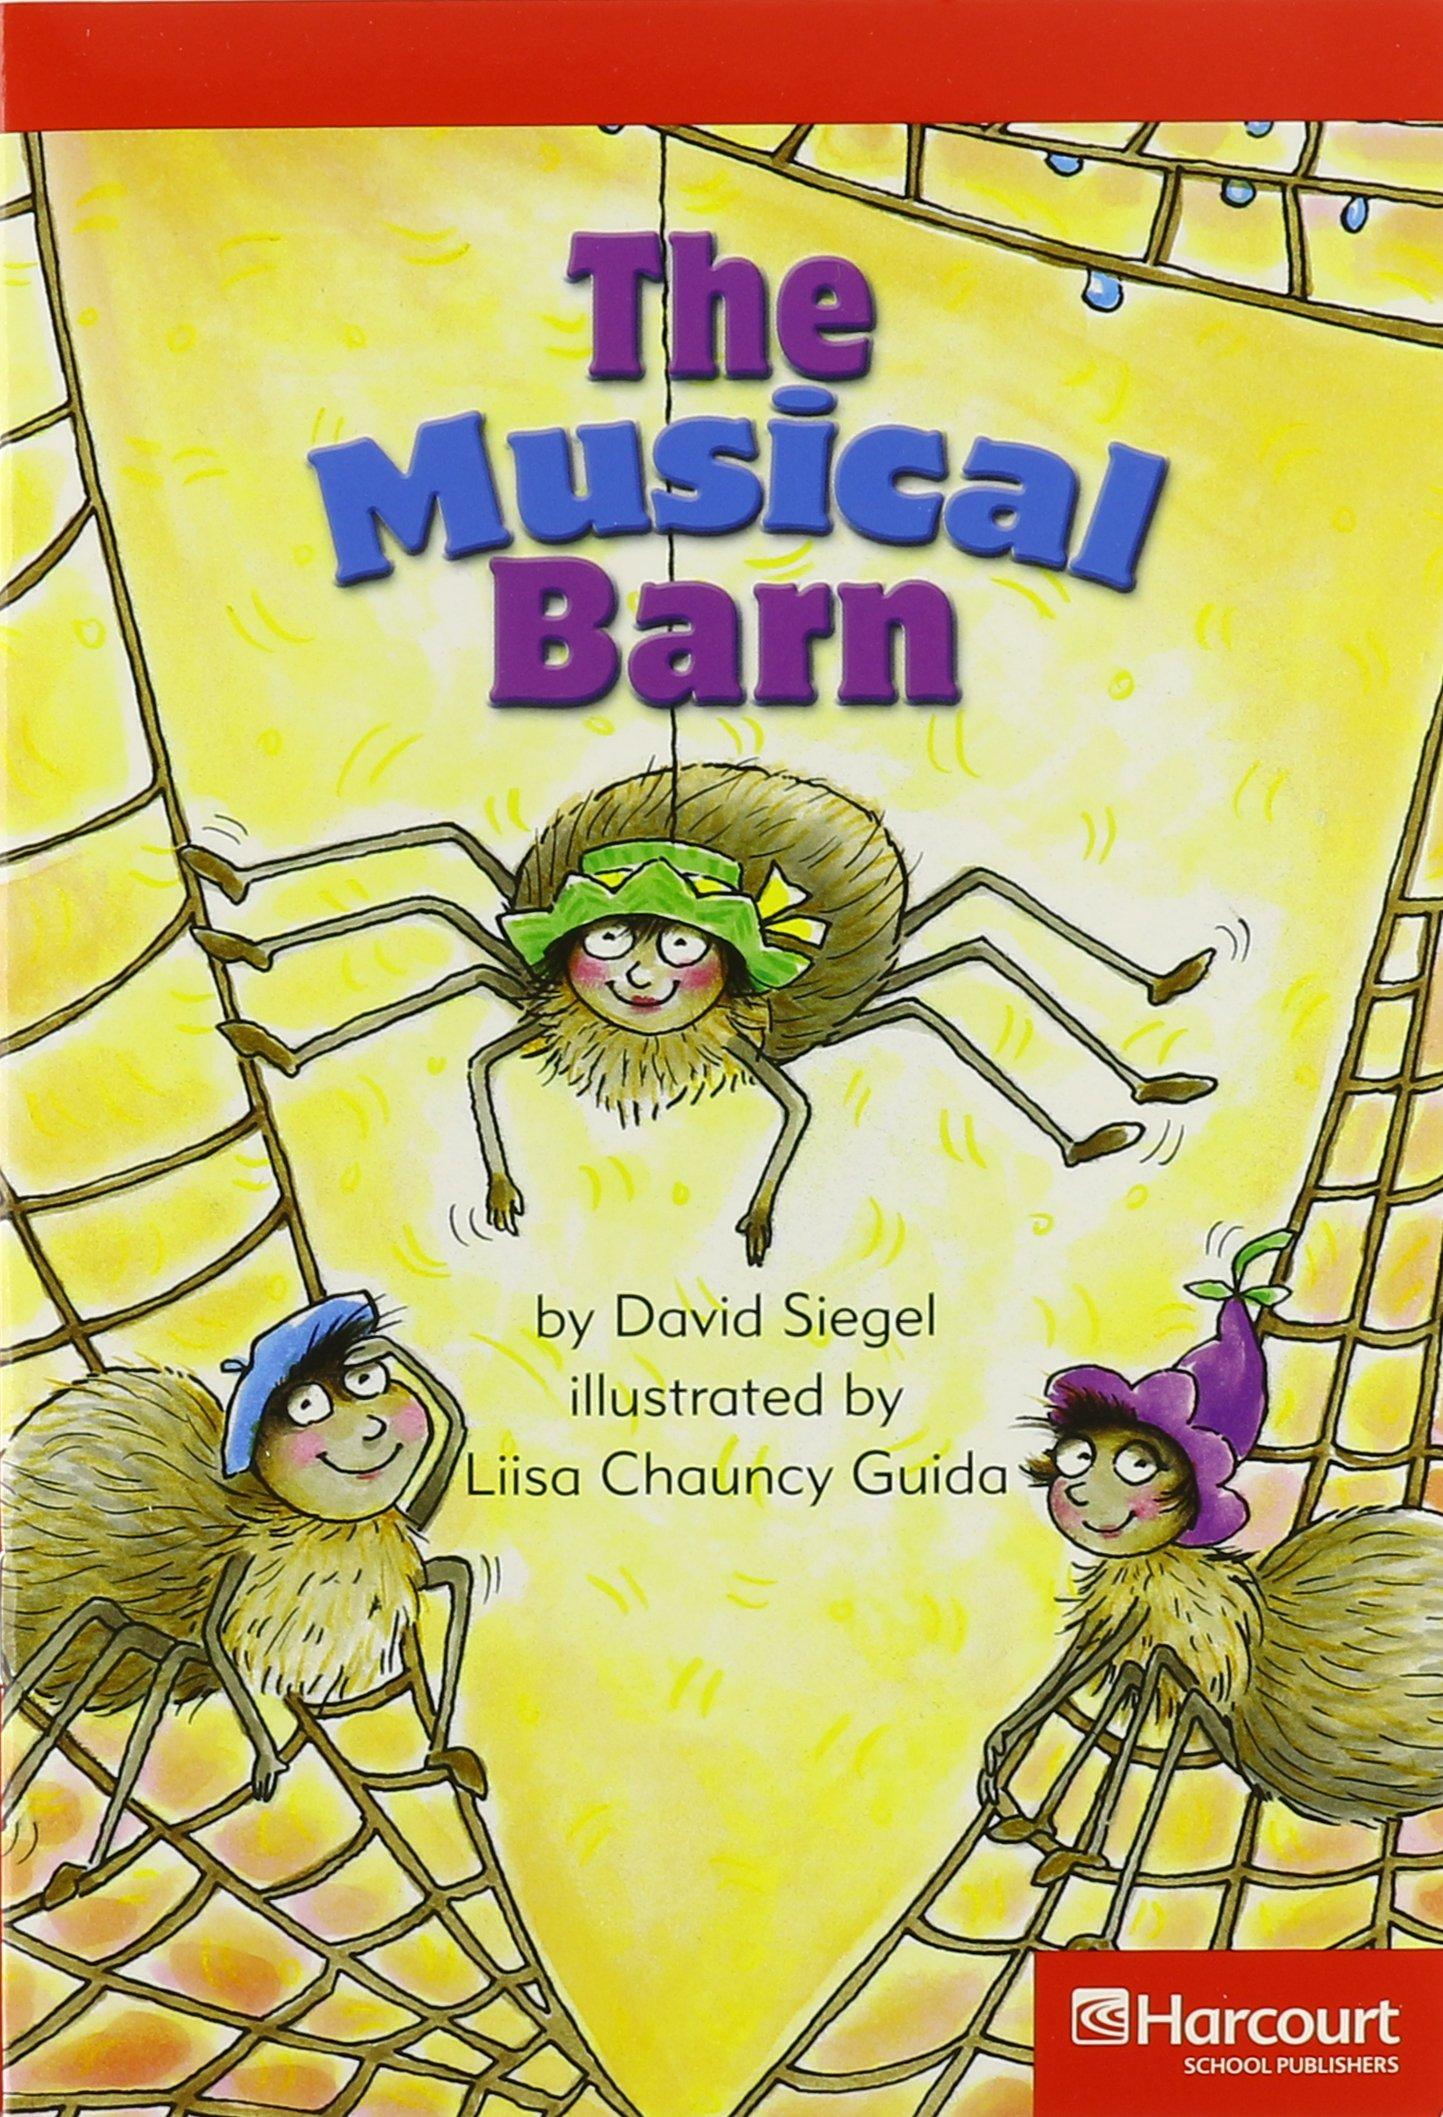 Read Online Storytown: Below-Level Reader 5-Pack Grade 3 The Musical Barn PDF